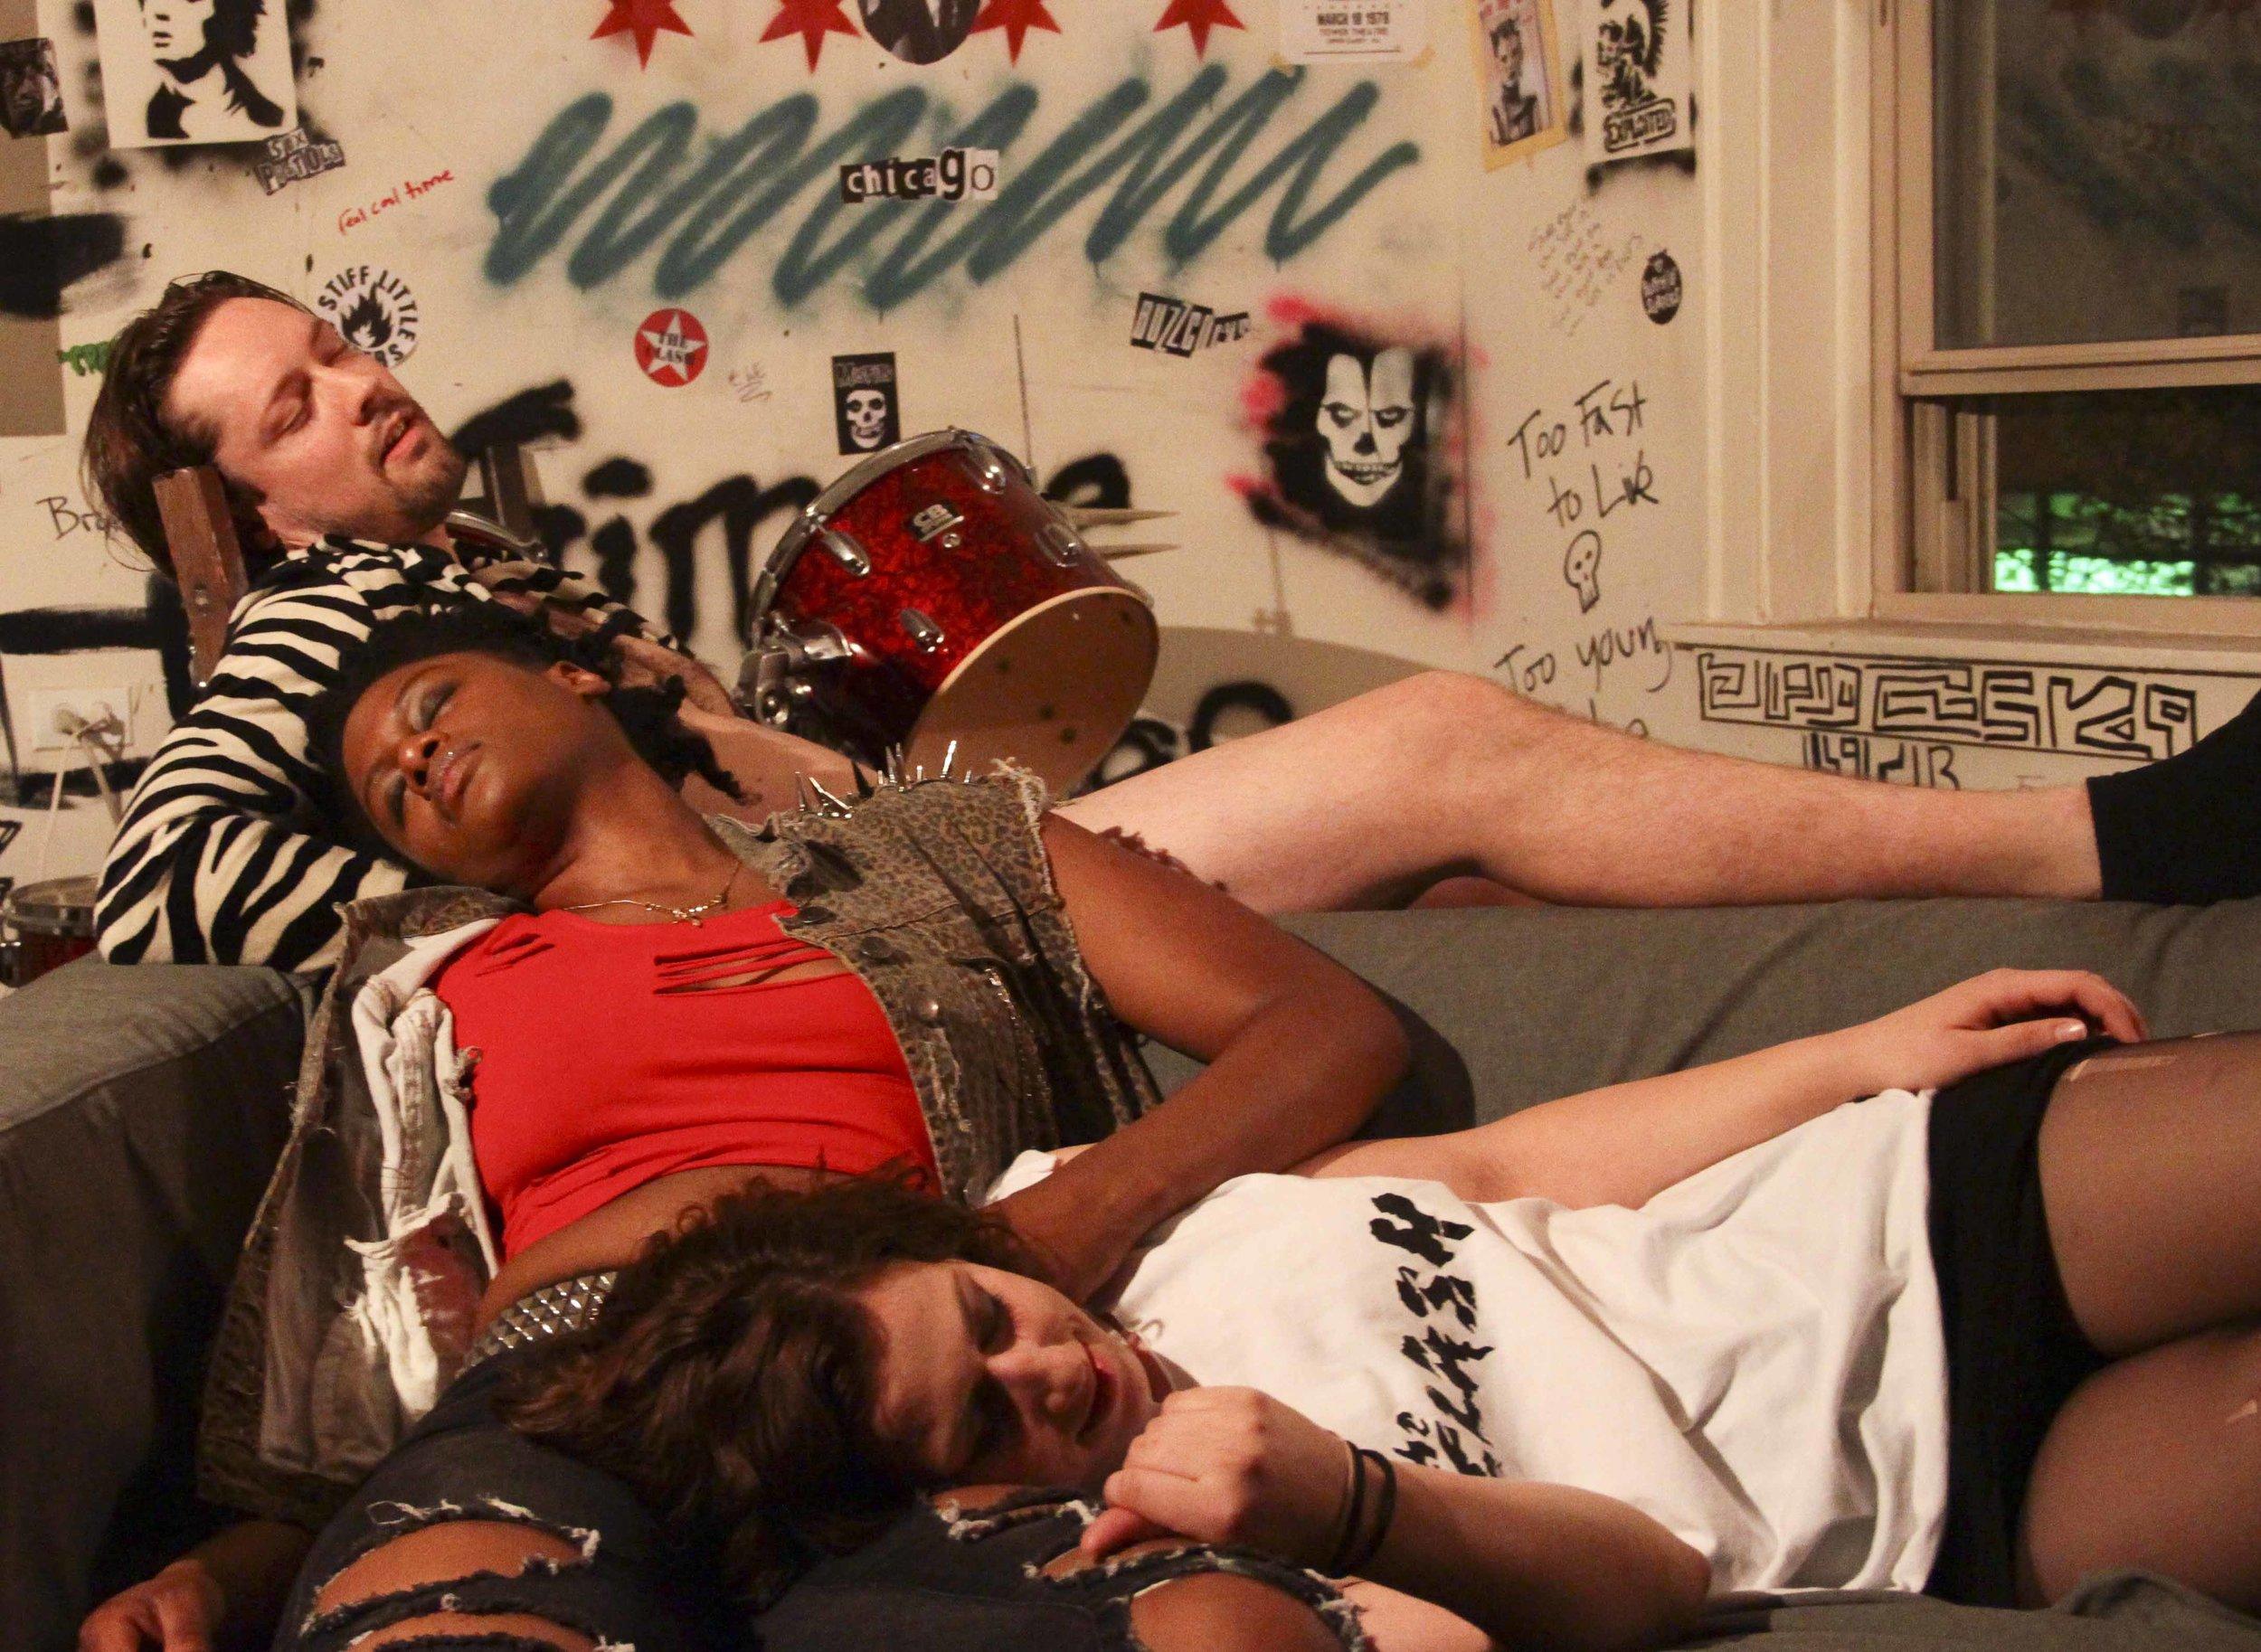 Adam Huizenga as Zig, Tarina Bradshaw and Cyn, and Alicia Jade as Nat